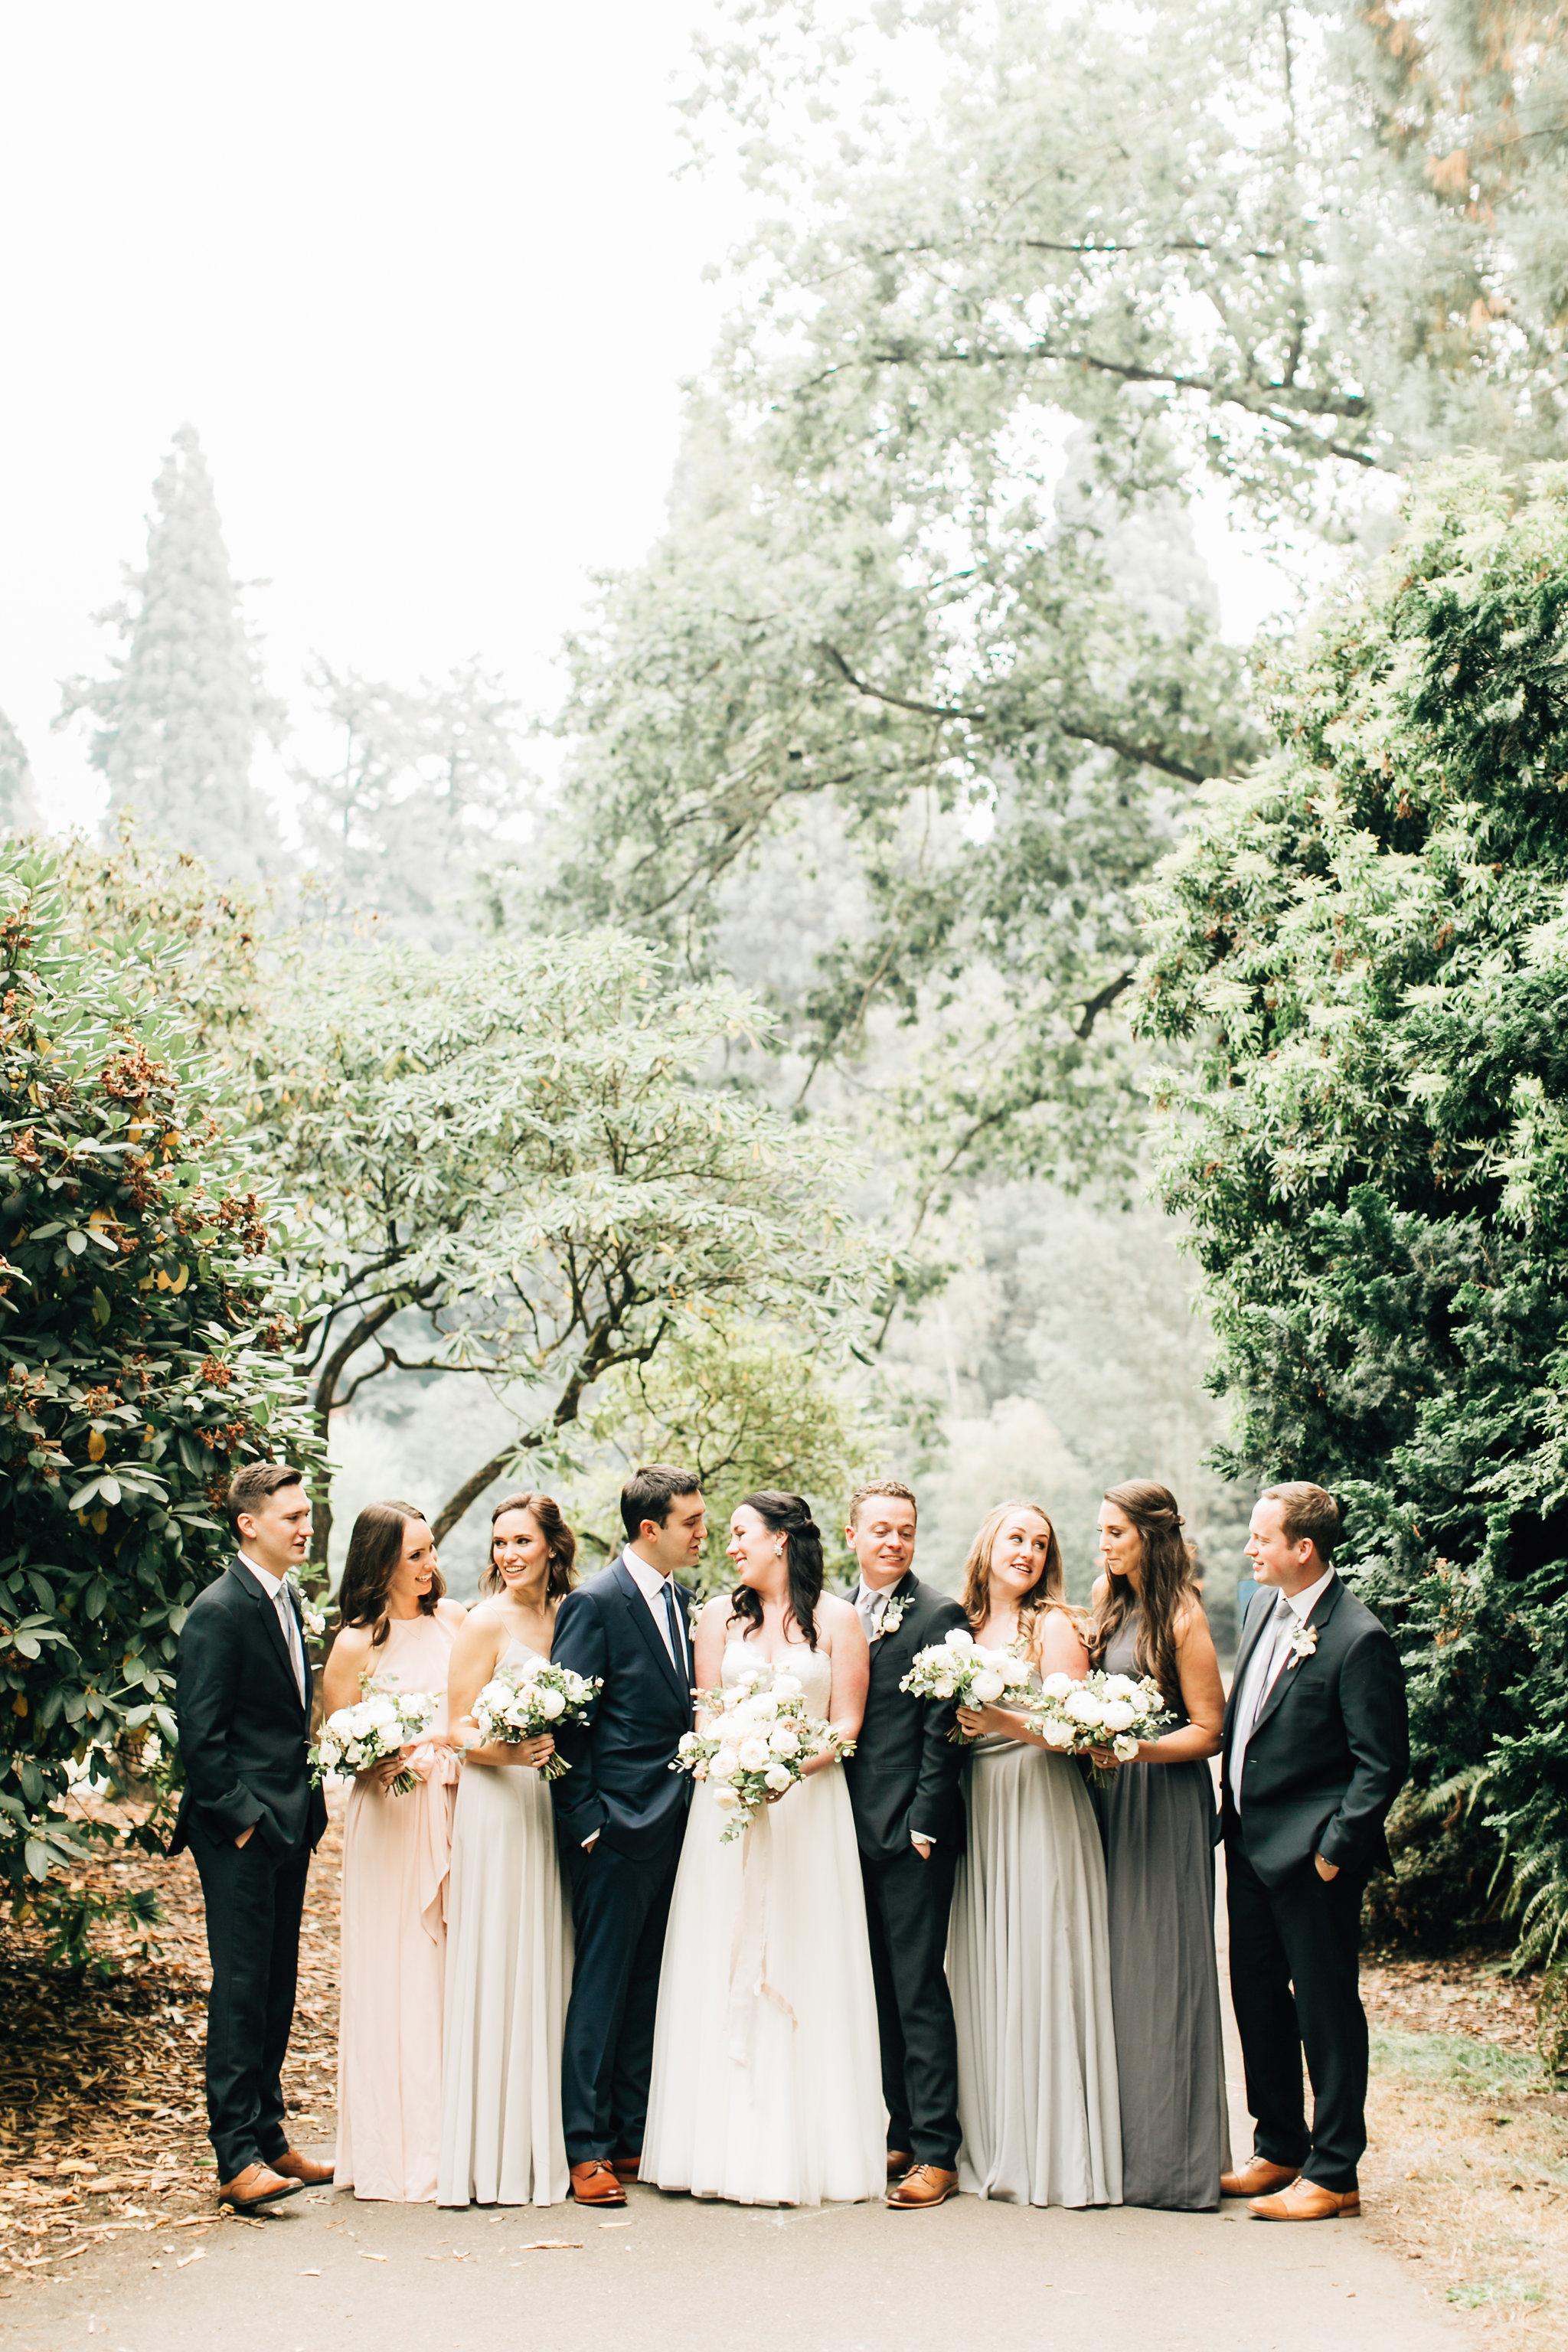 Bridal Party Bridesmaids Seventh Ste